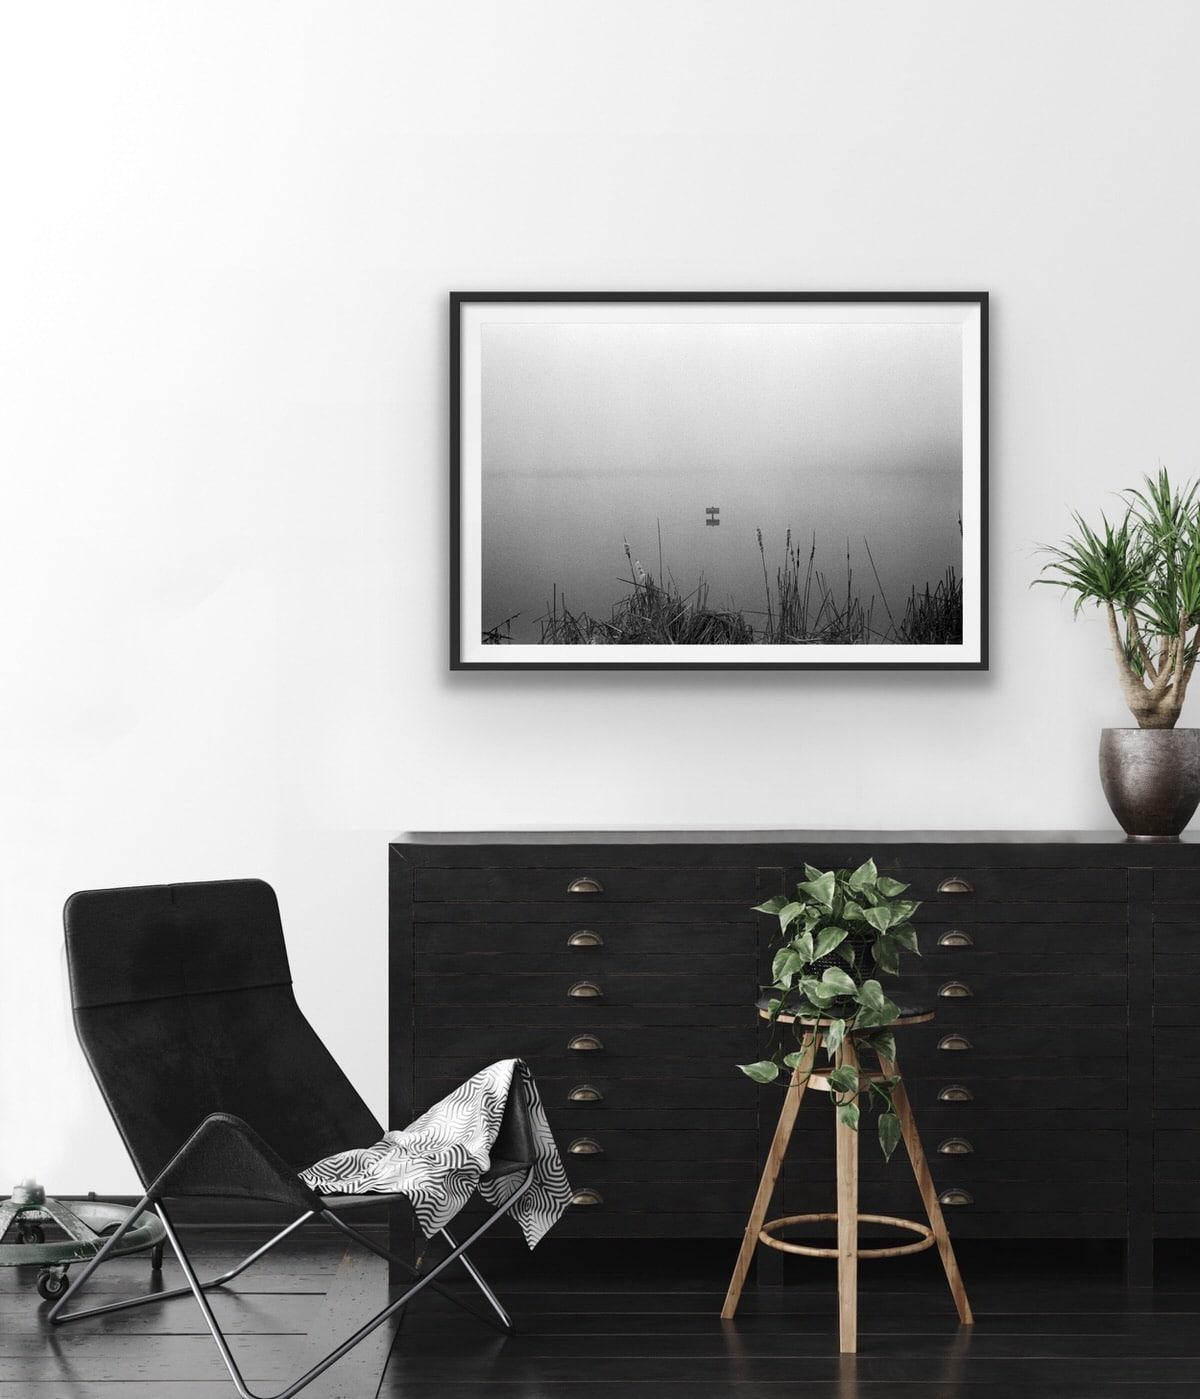 Black-and-white-fine-art-film-photography-wall-decor-by-emerging-artist-Studio-L-photographer-Laura-Schneider-_4689